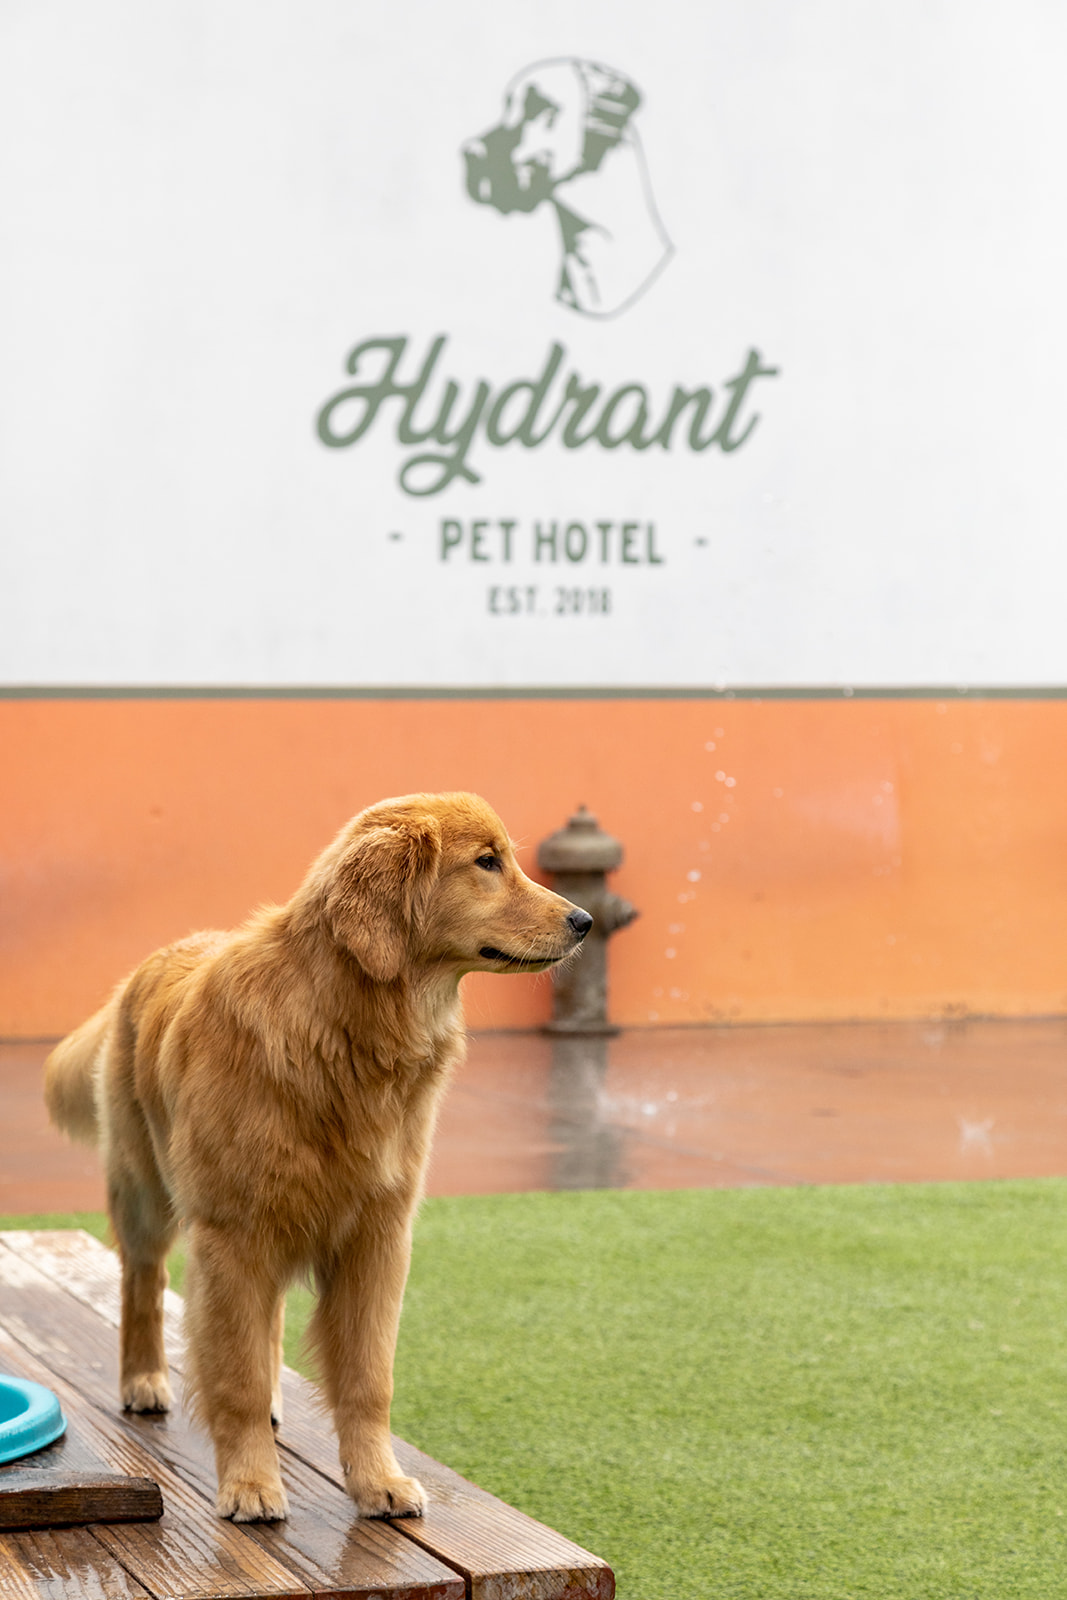 Hydrant Pet Hotel